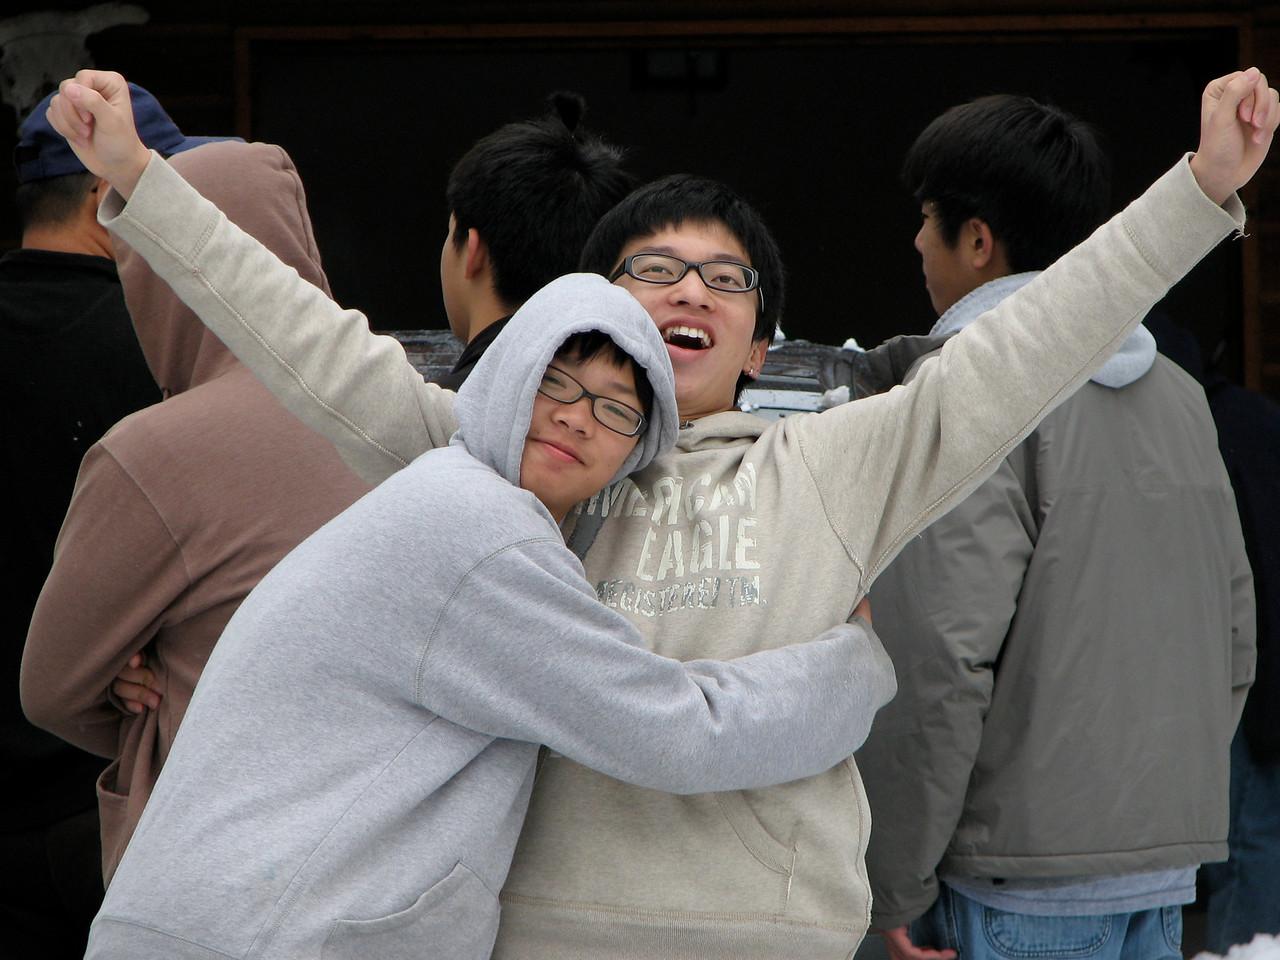 2006 12 23 Sat - Jeremy Hsu & Jimmy Lee so happy together